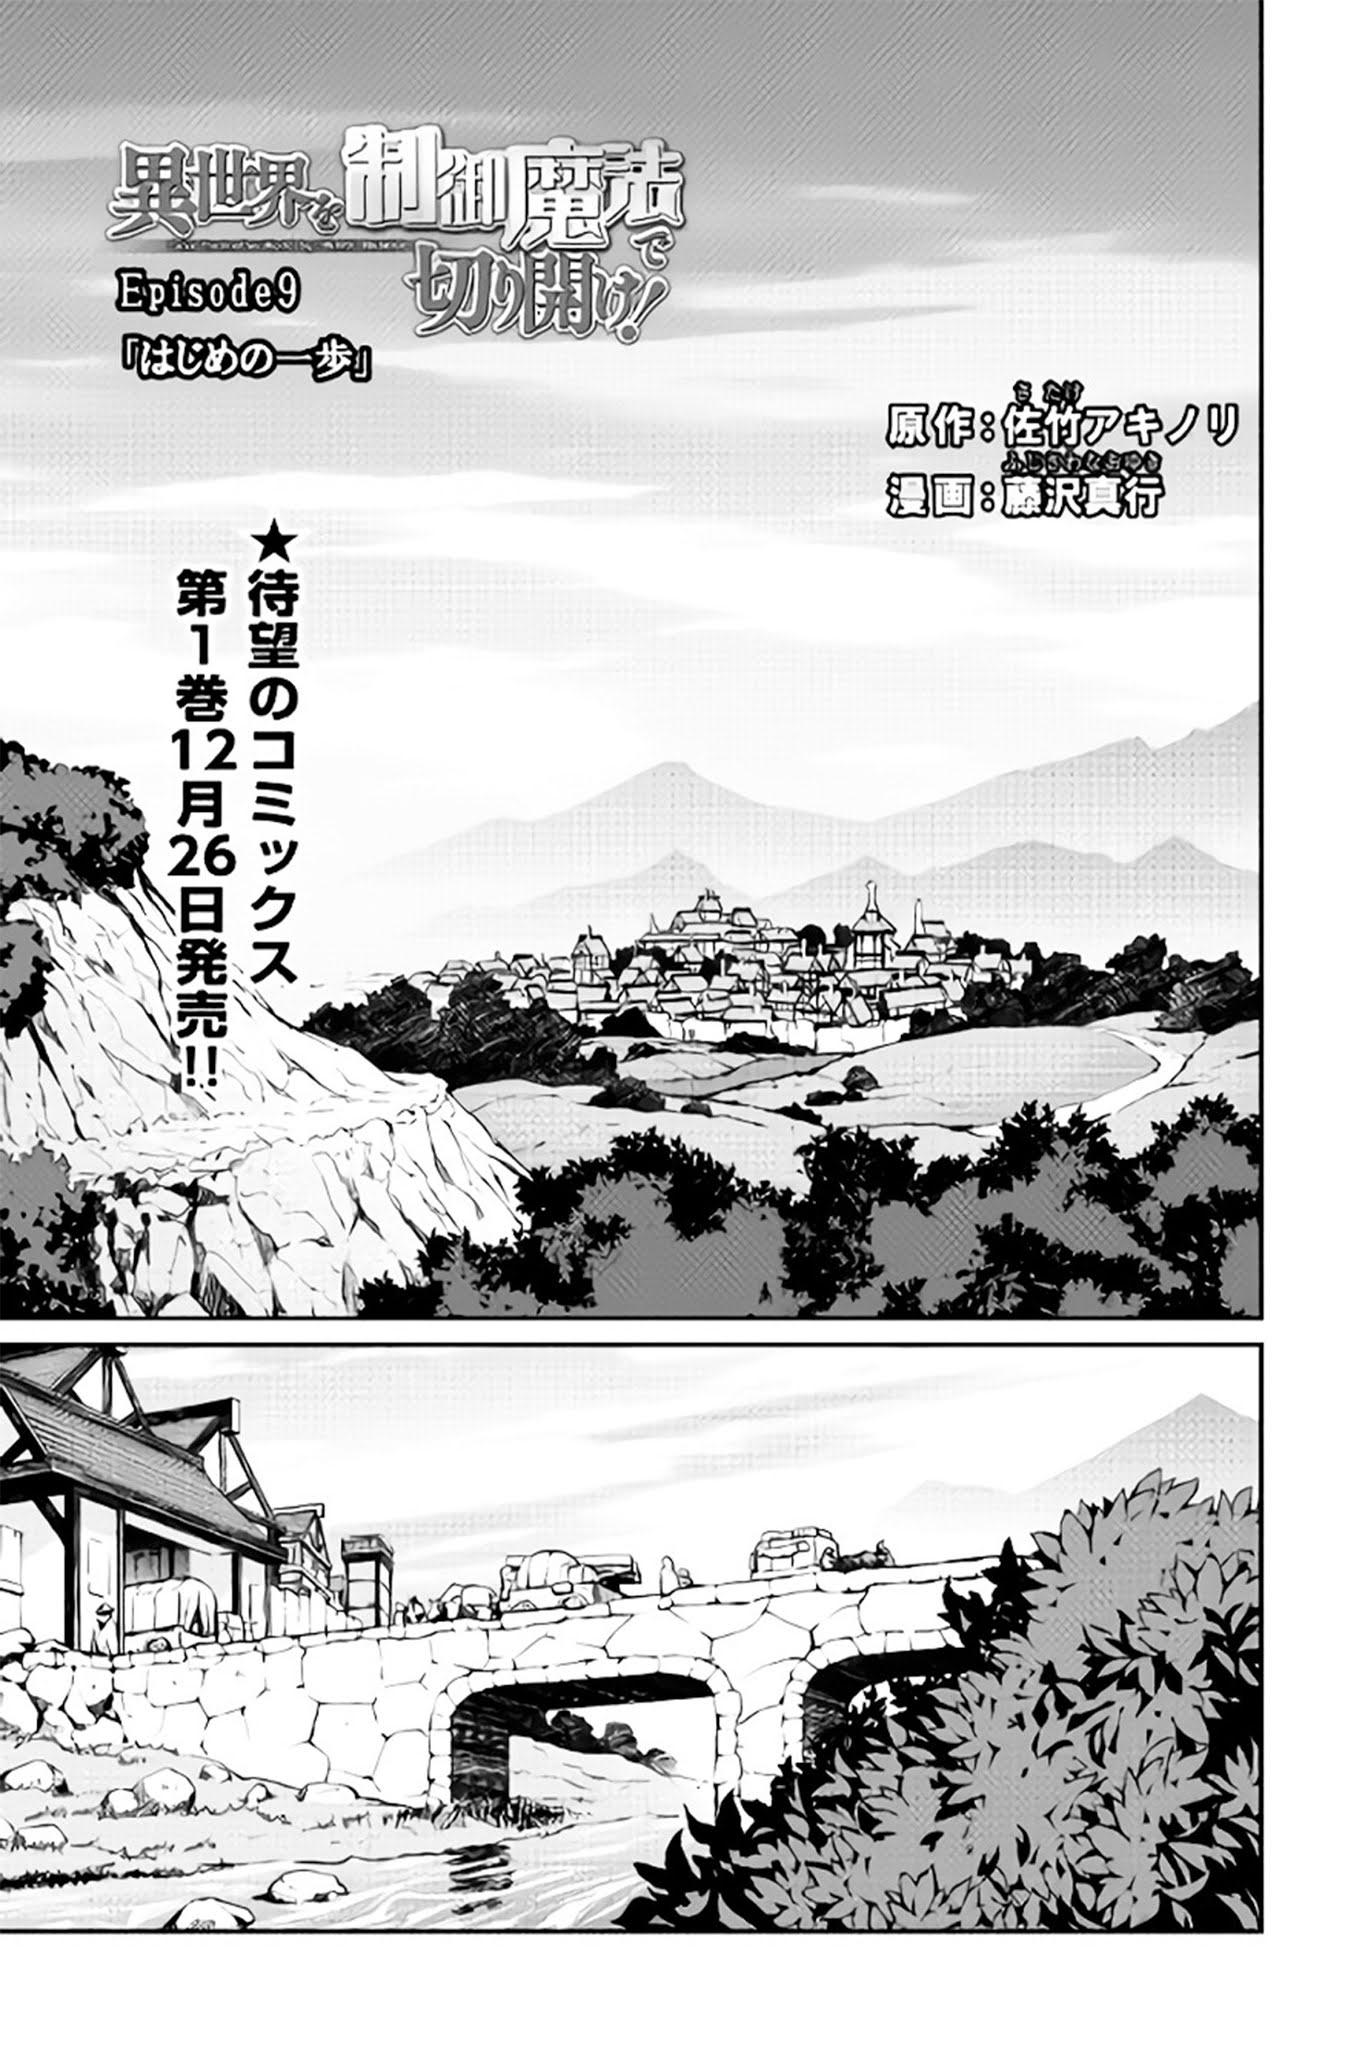 Isekai wo Seigyo Mahou de Kirihirake!-ตอนที่ 9